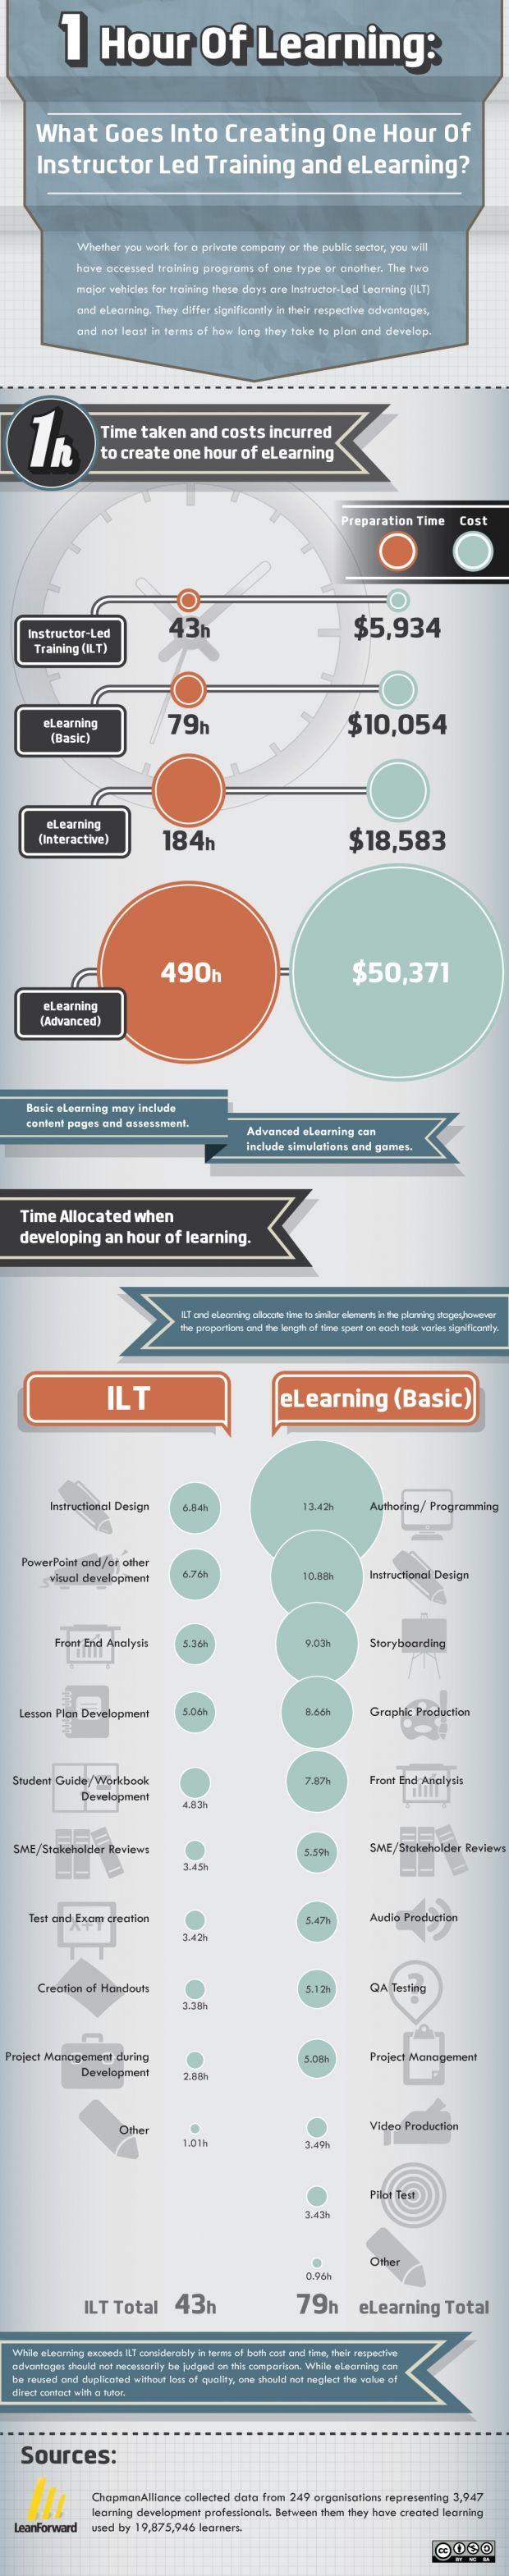 Instructor-Led Training Vs eLearning Infographic